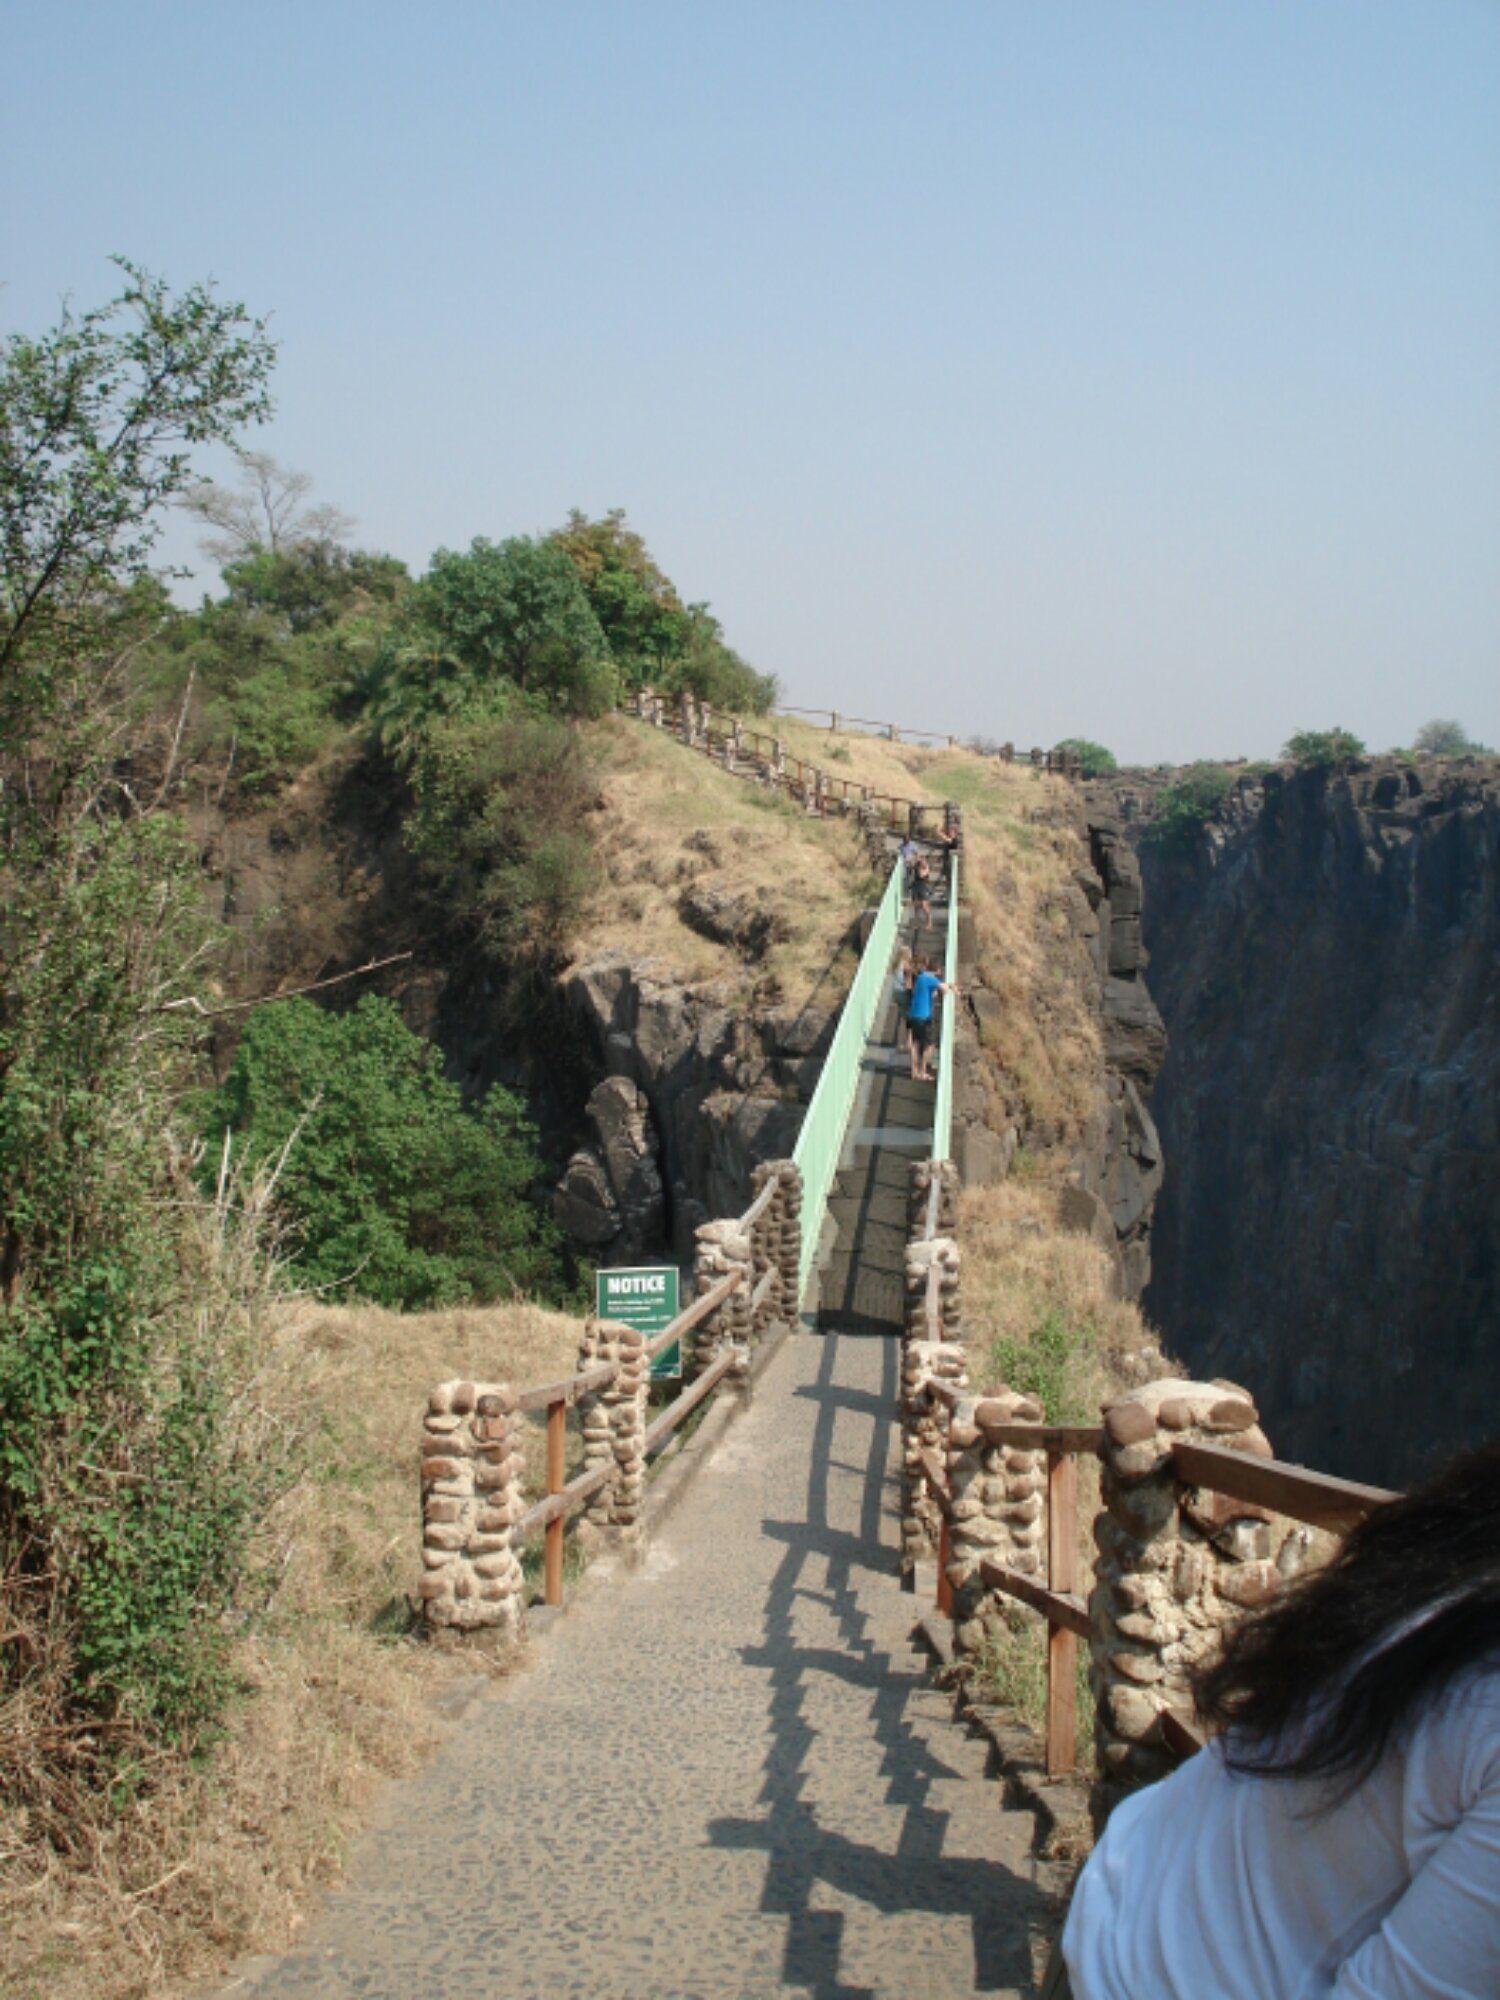 Victoria Falls Bridge which connects Zambia and Zimbabwe